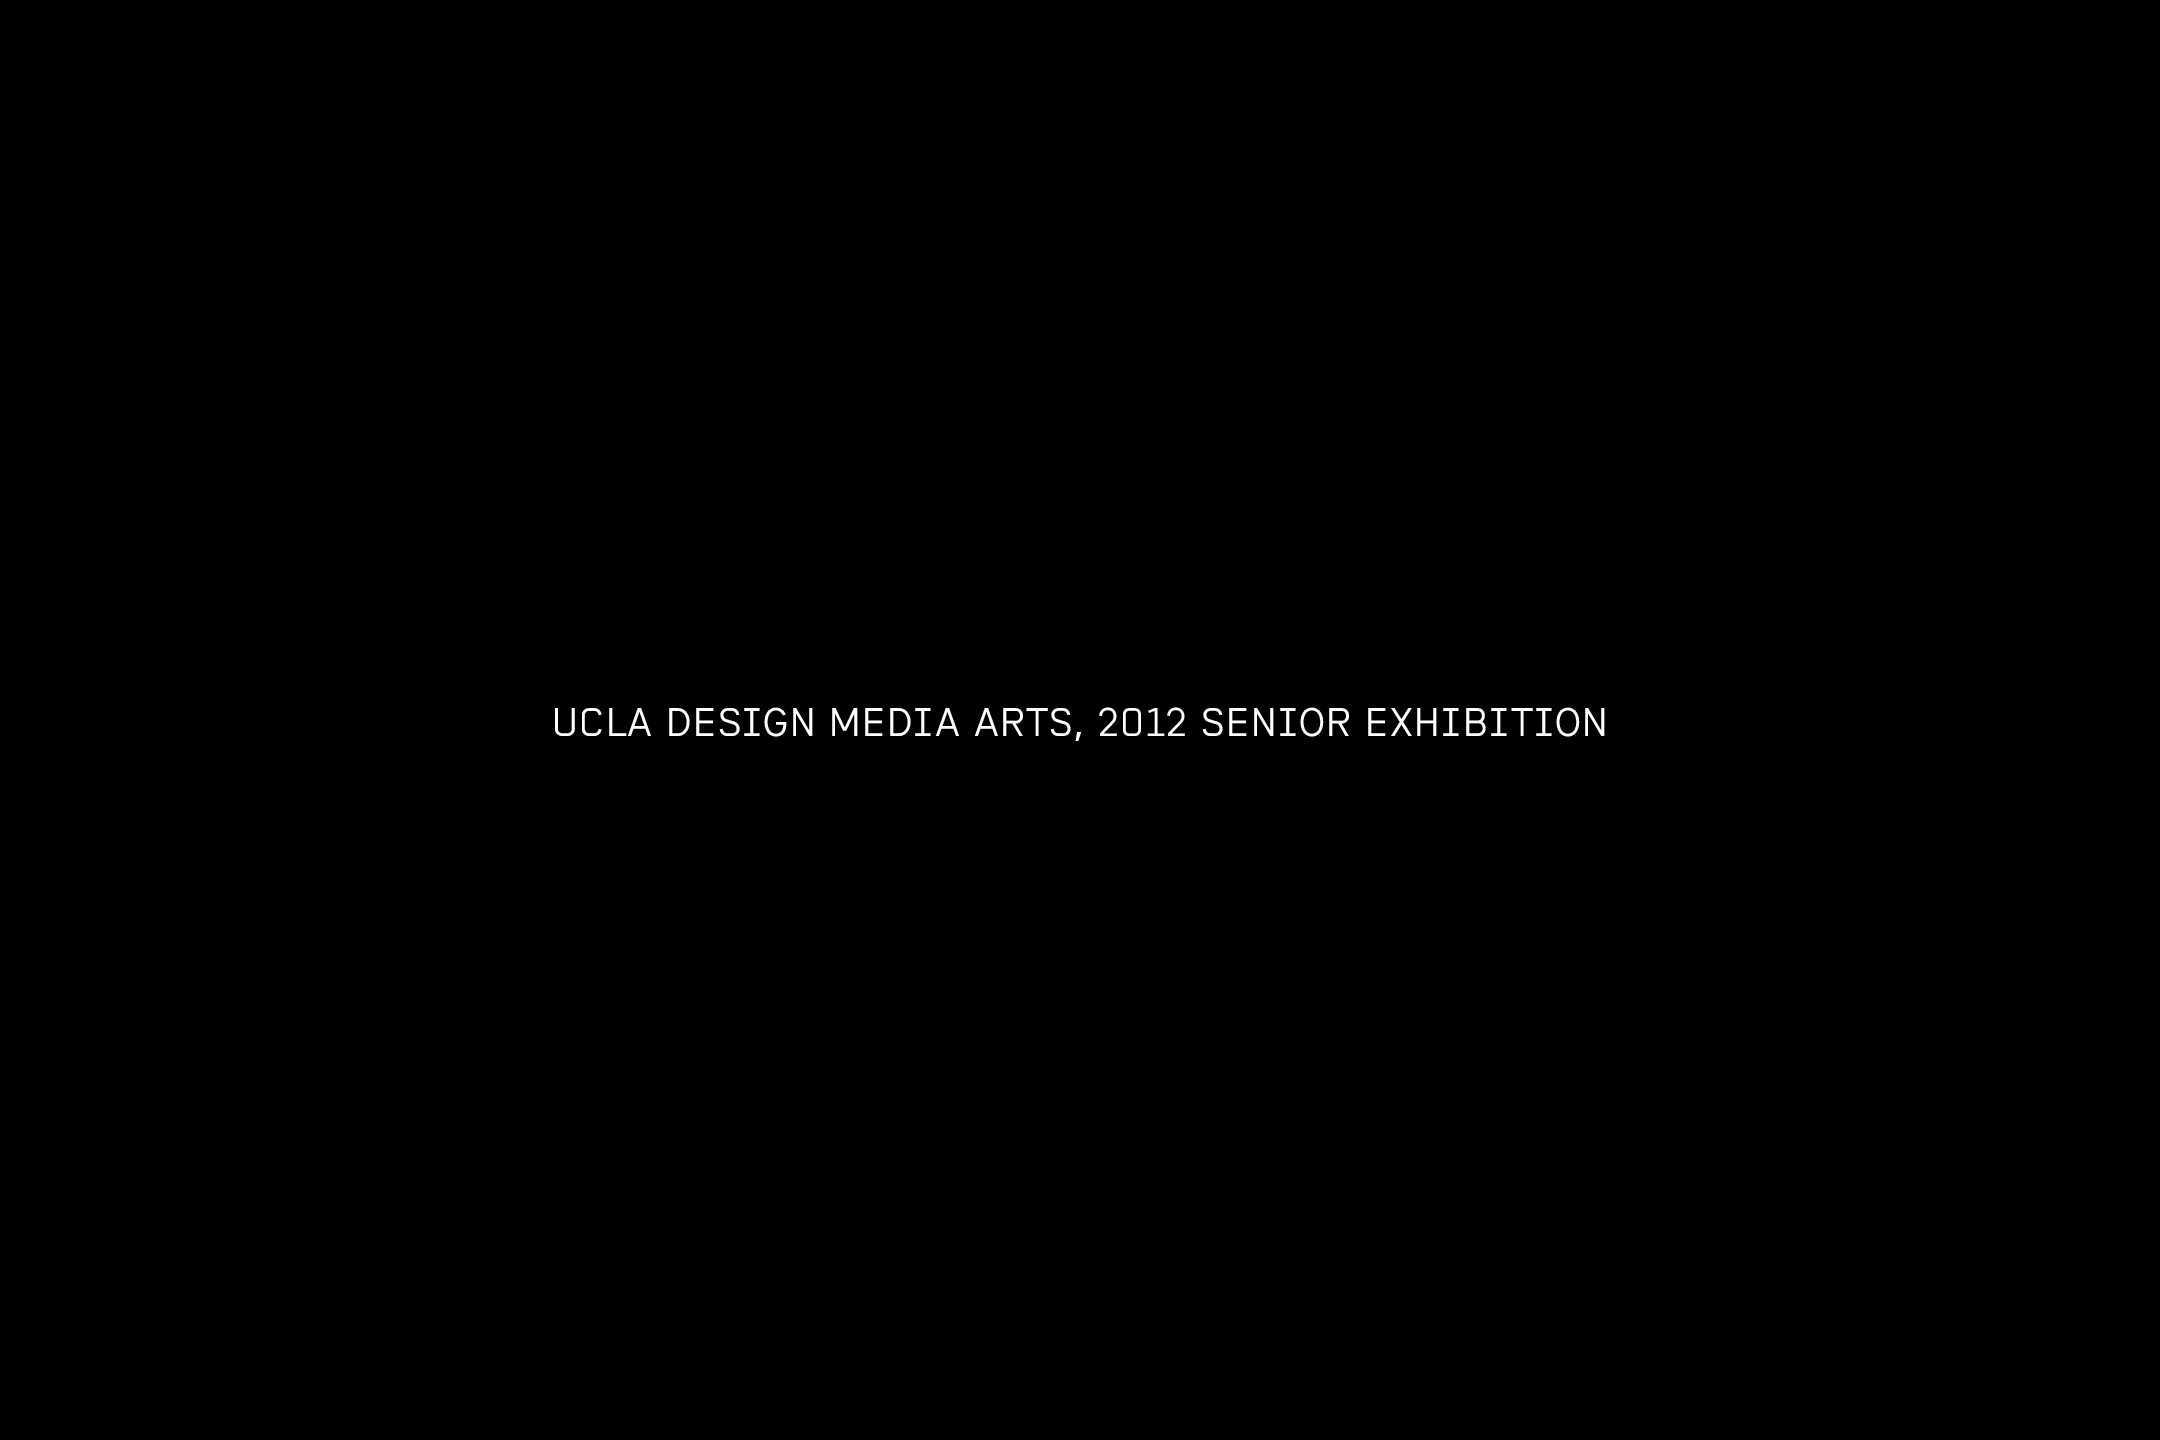 ucla-dma-senior.jpg